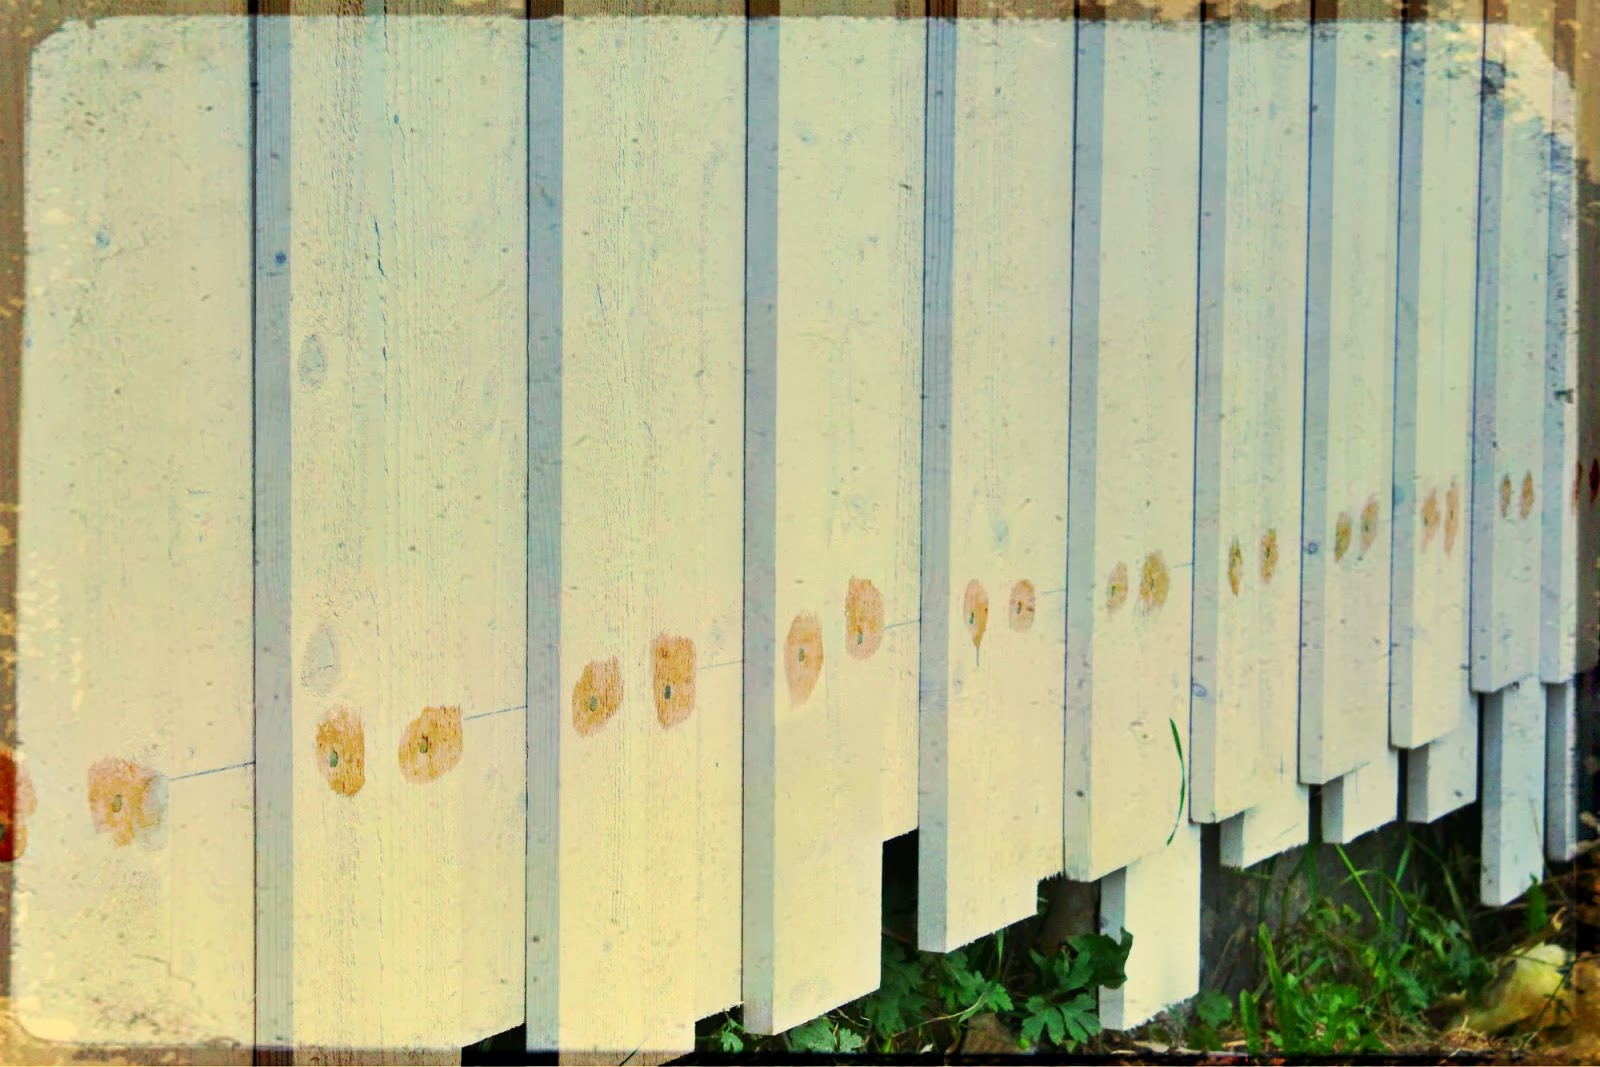 Jotun Maling Priser : Hus i skogen maling